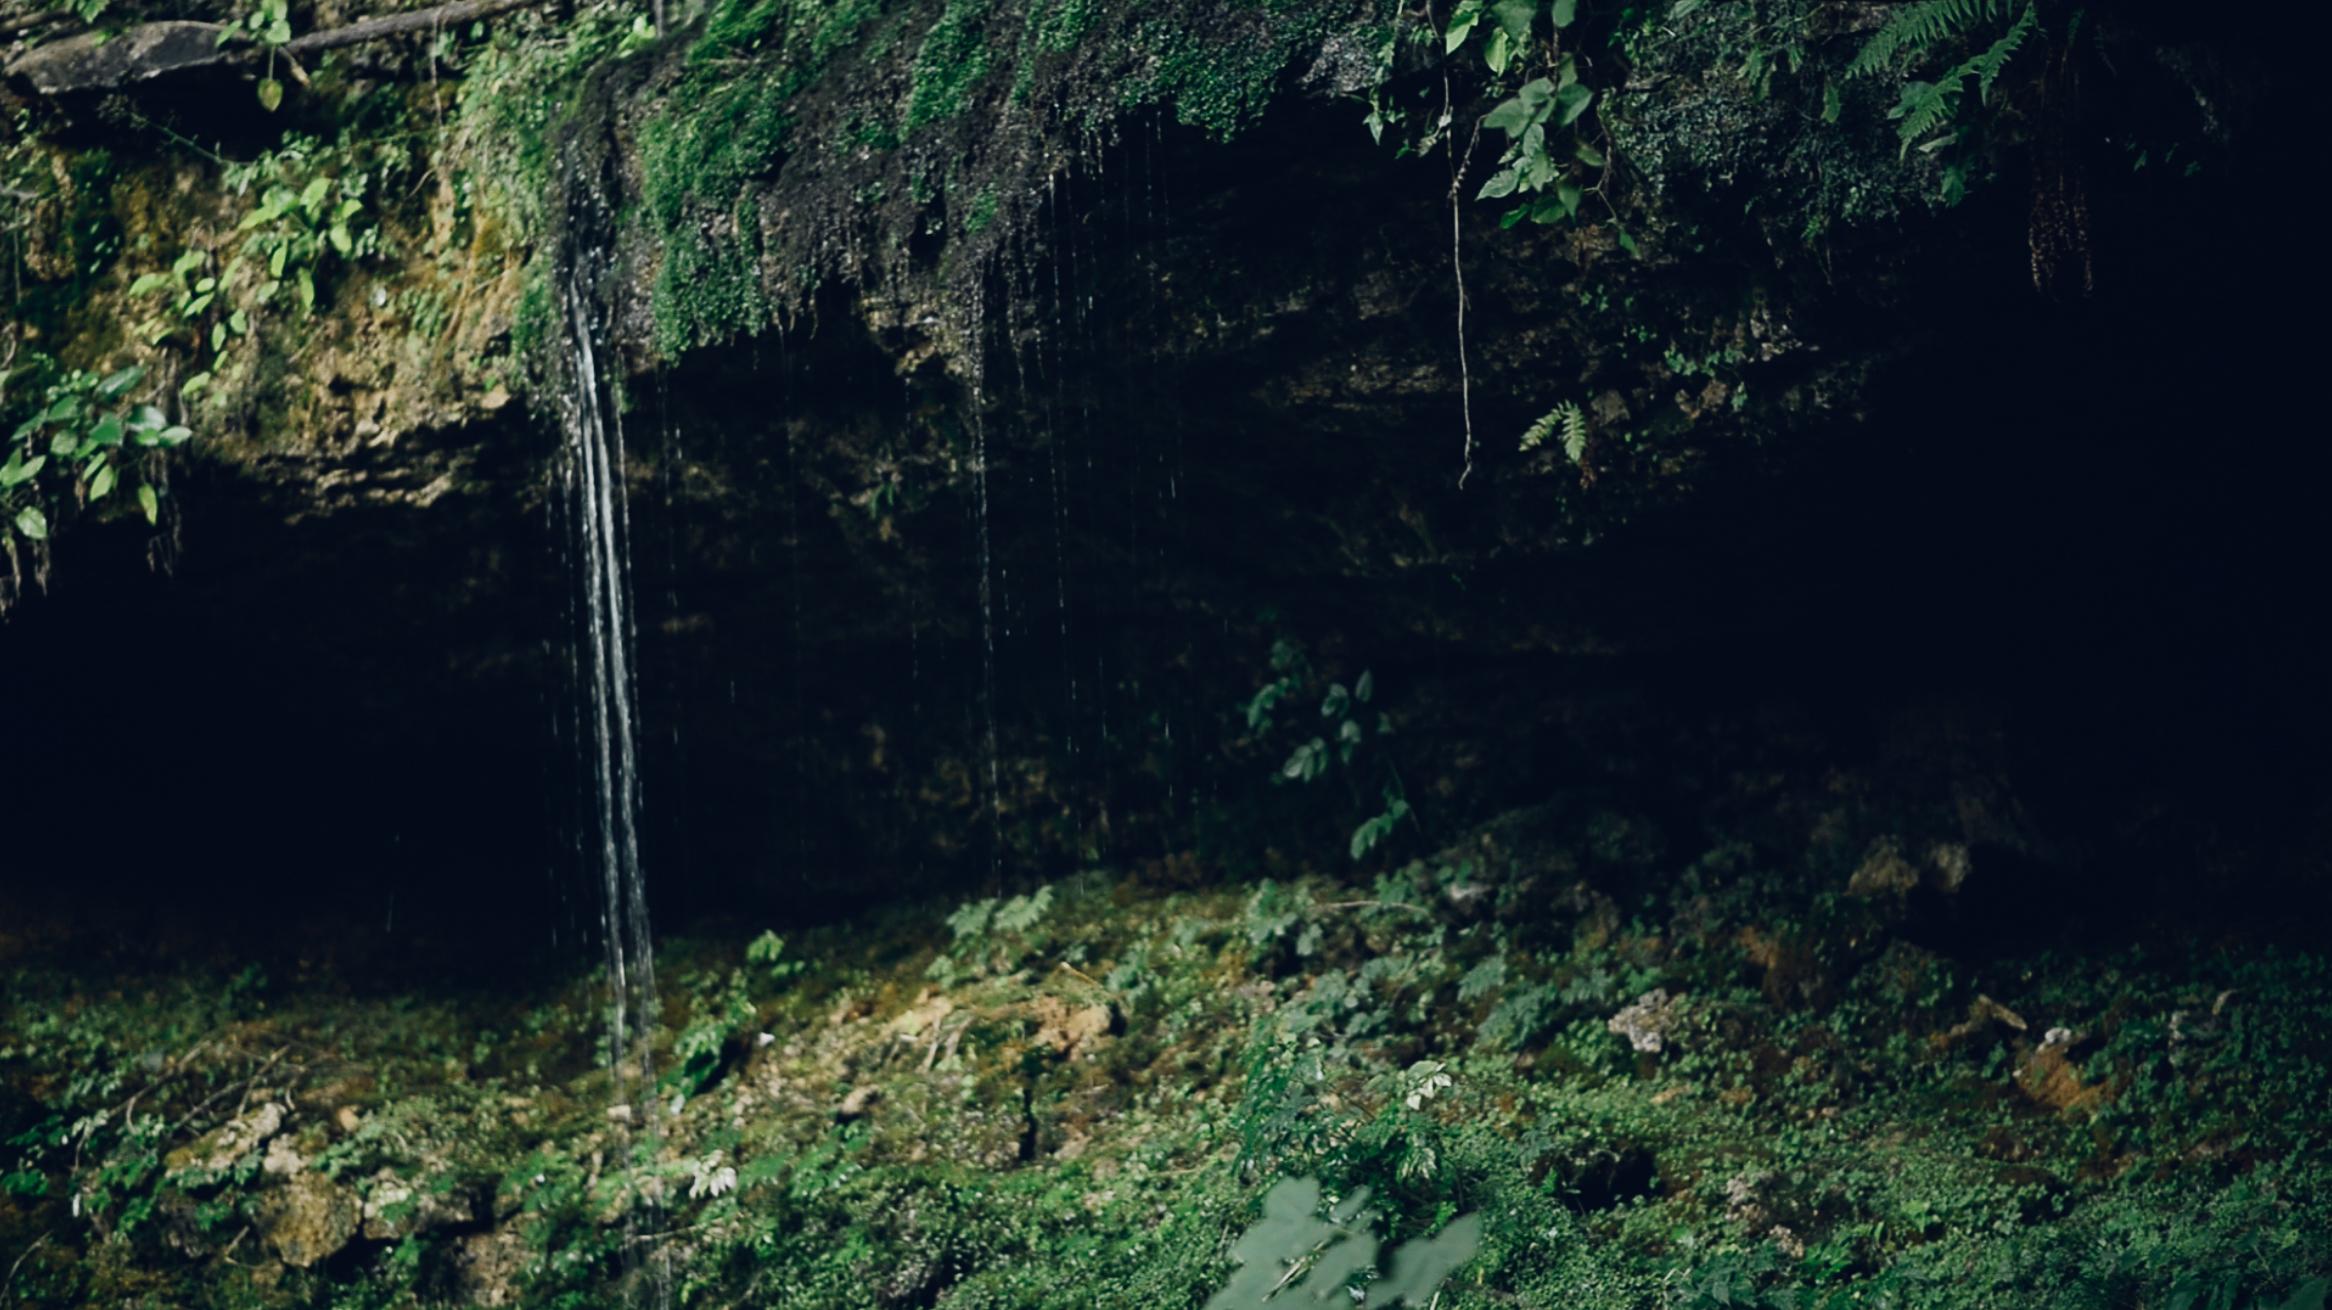 cave_kjazbec-24.jpg